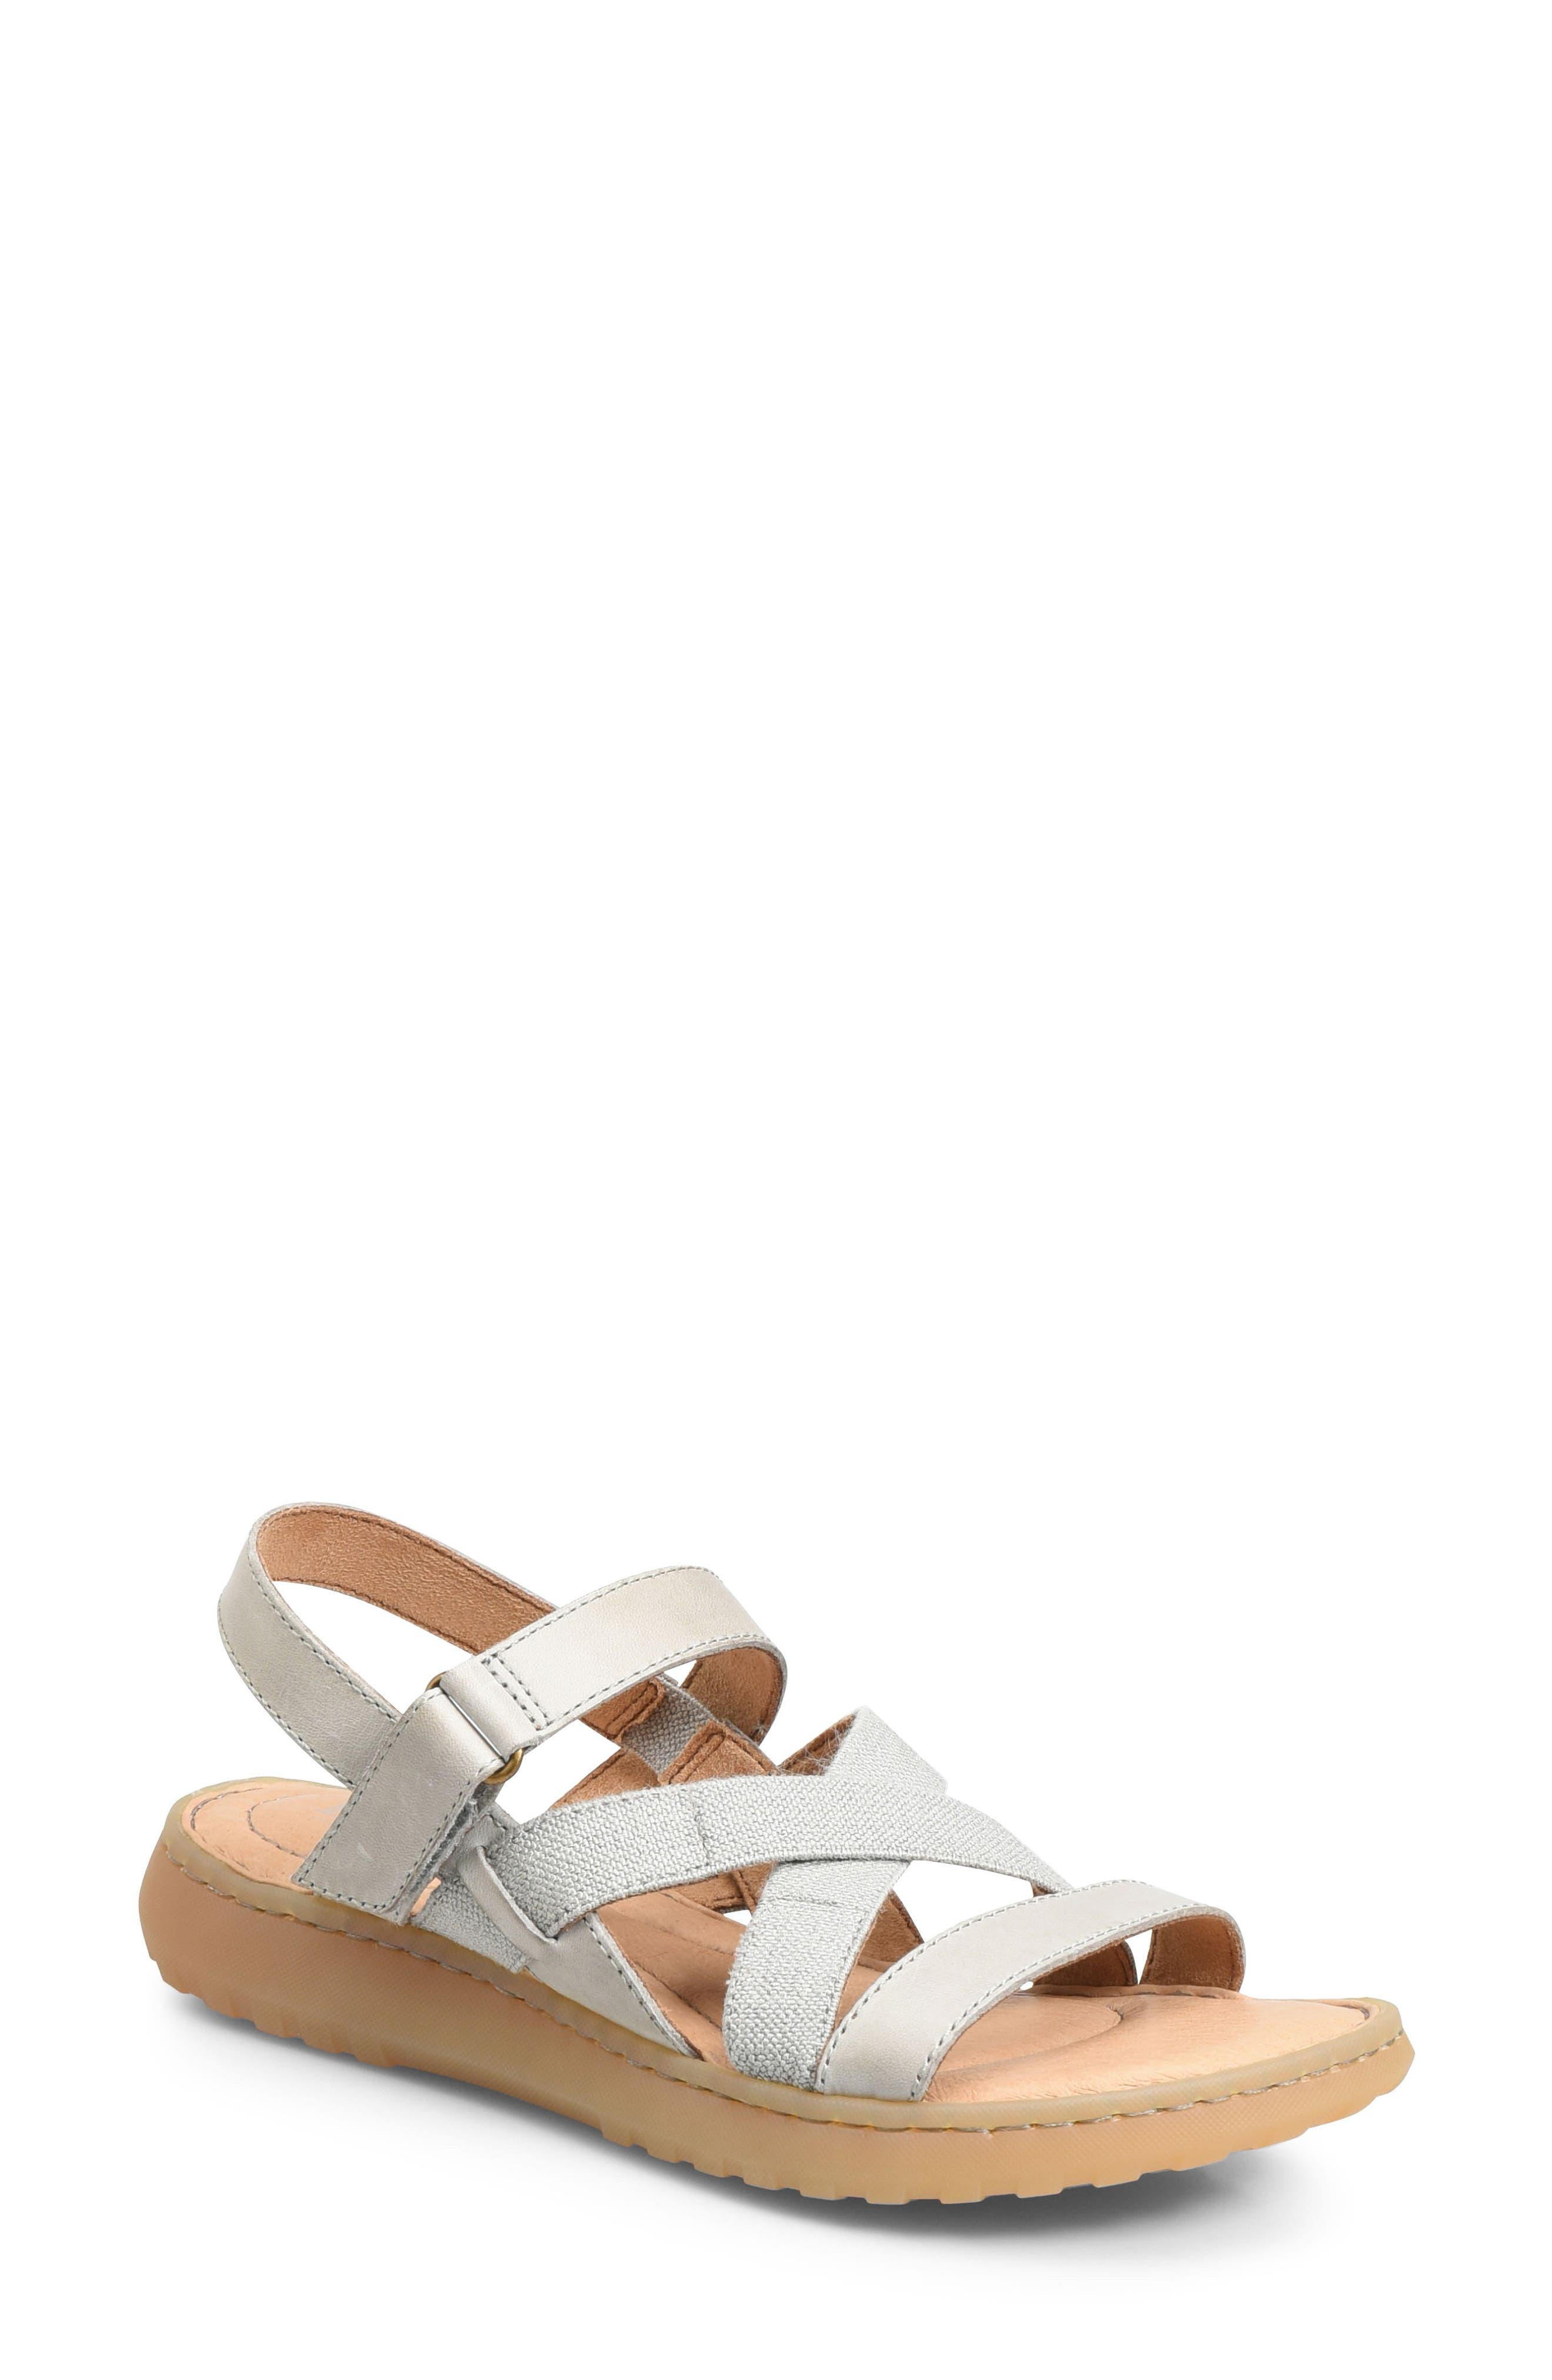 Manta Sandal,                         Main,                         color, Light Grey Leather